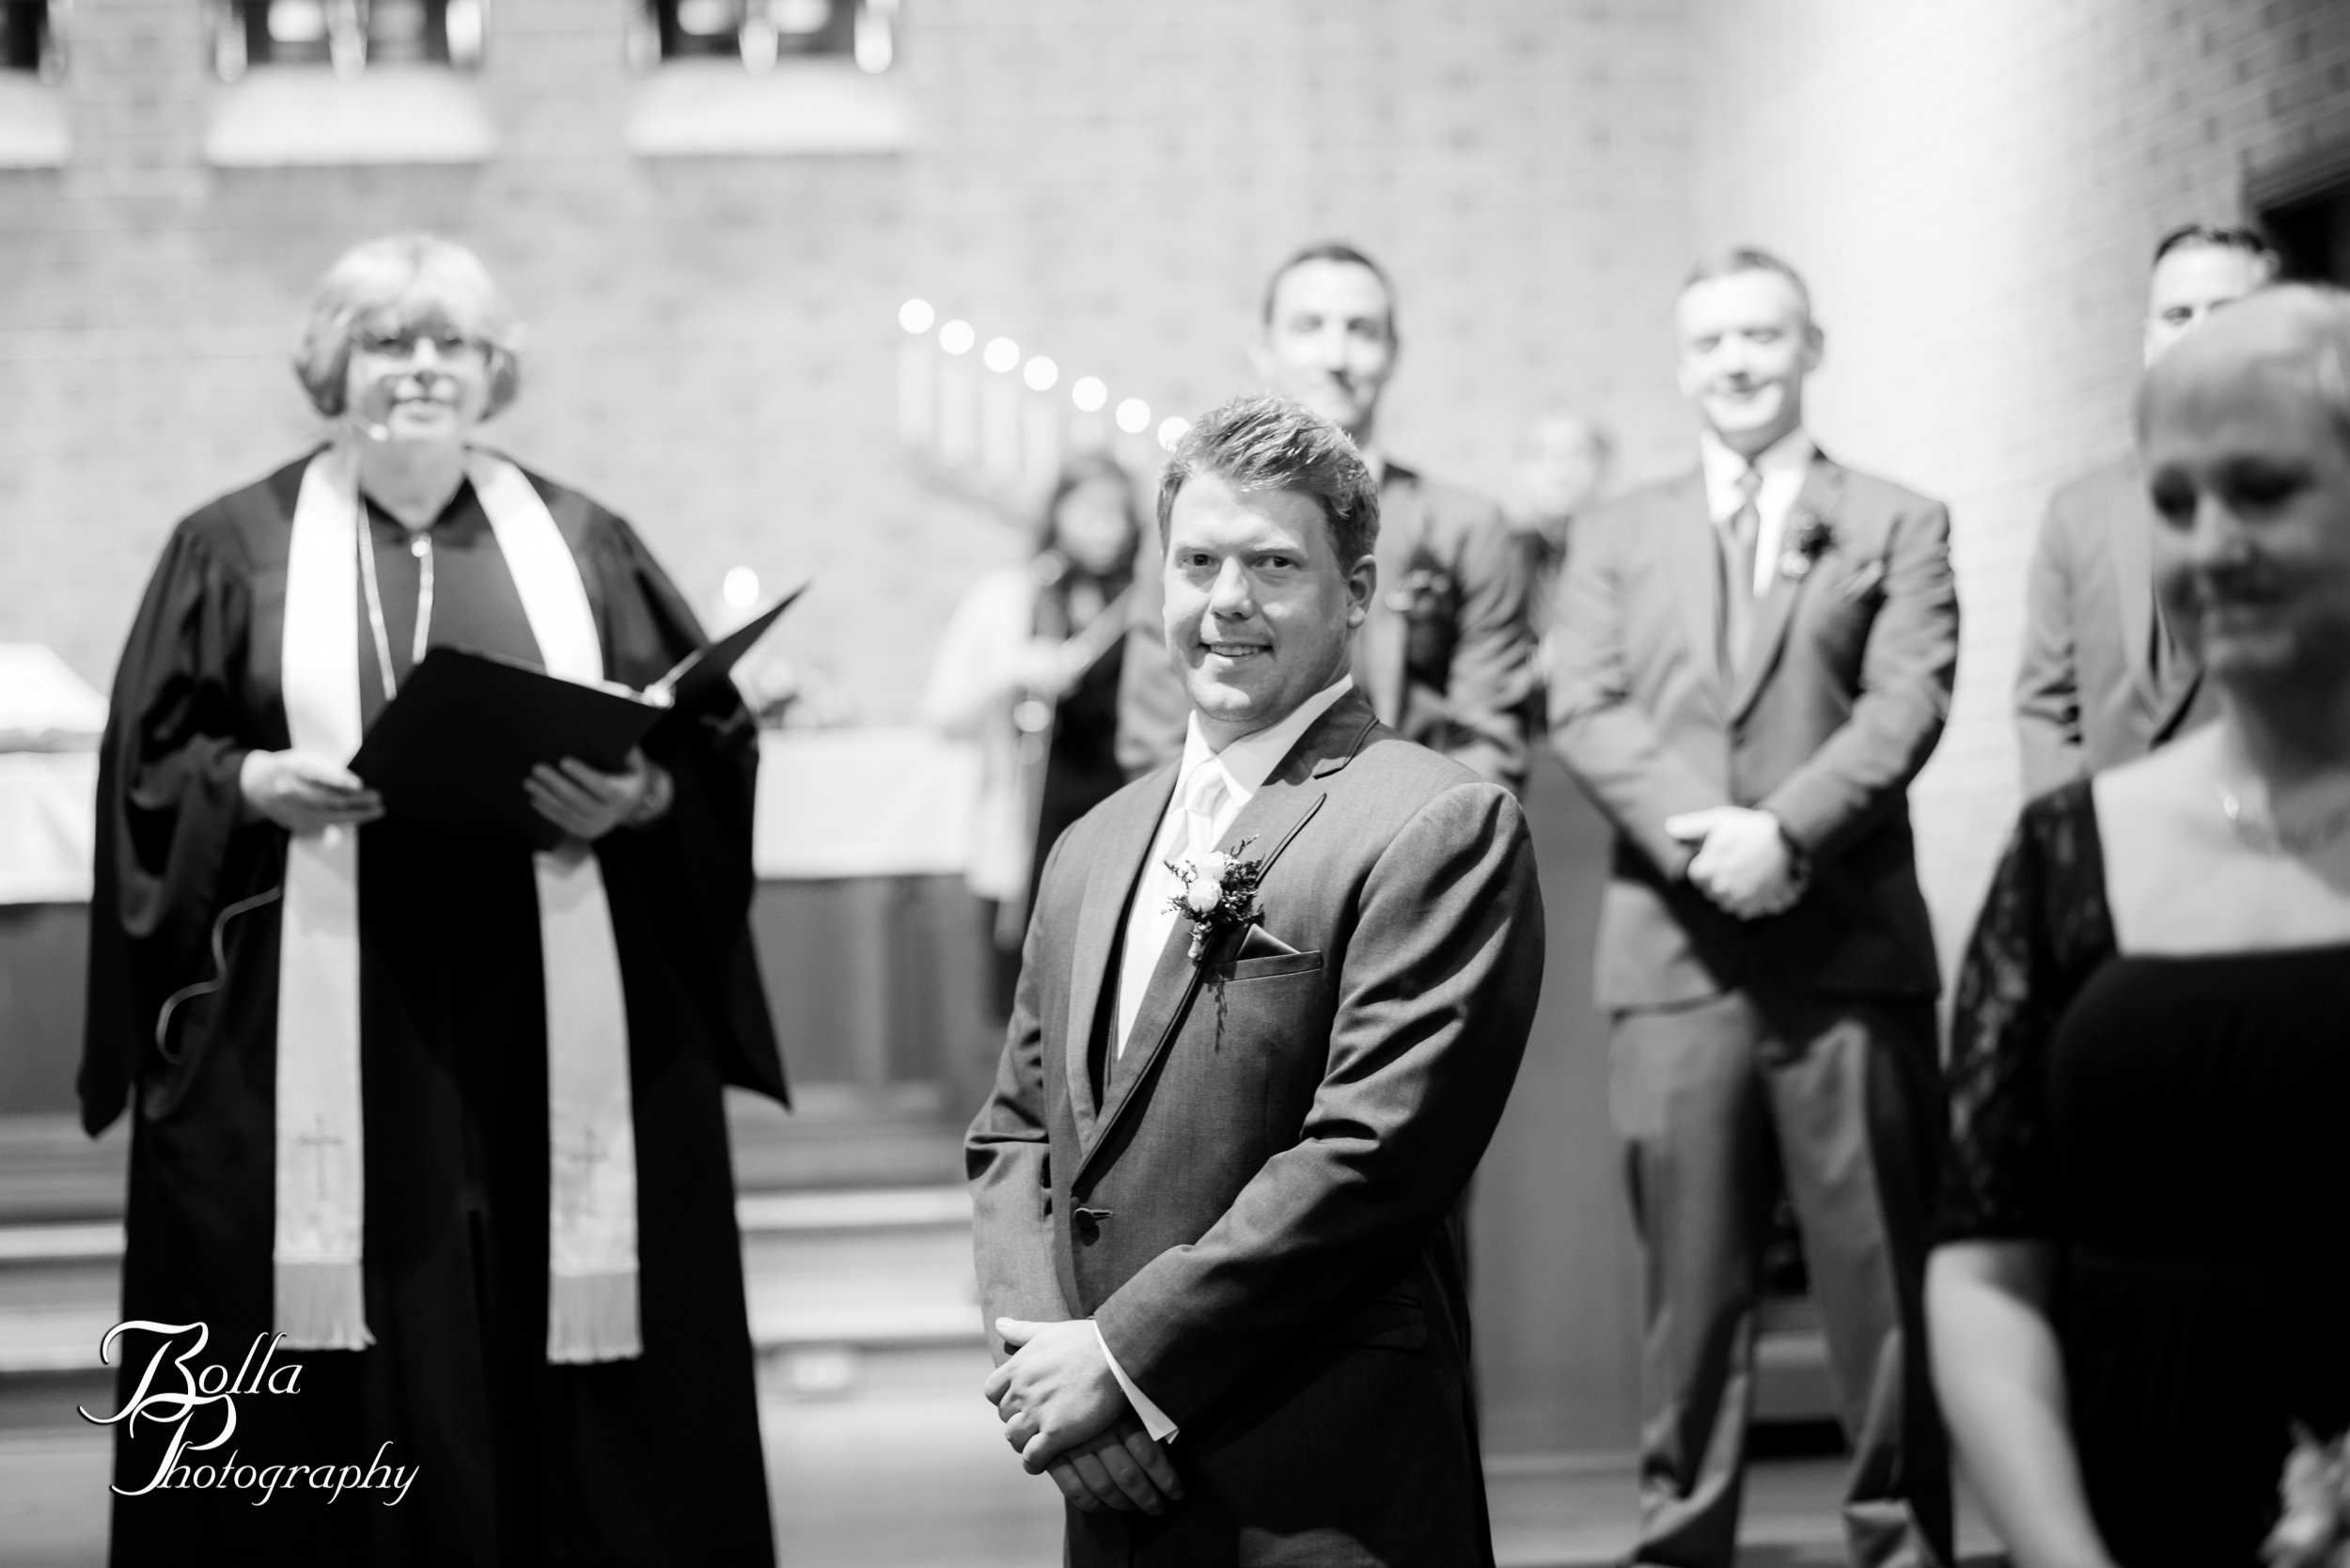 Bolla_photography_edwardsville_wedding_photographer_st_louis_weddings_Reilmann-0130.jpg